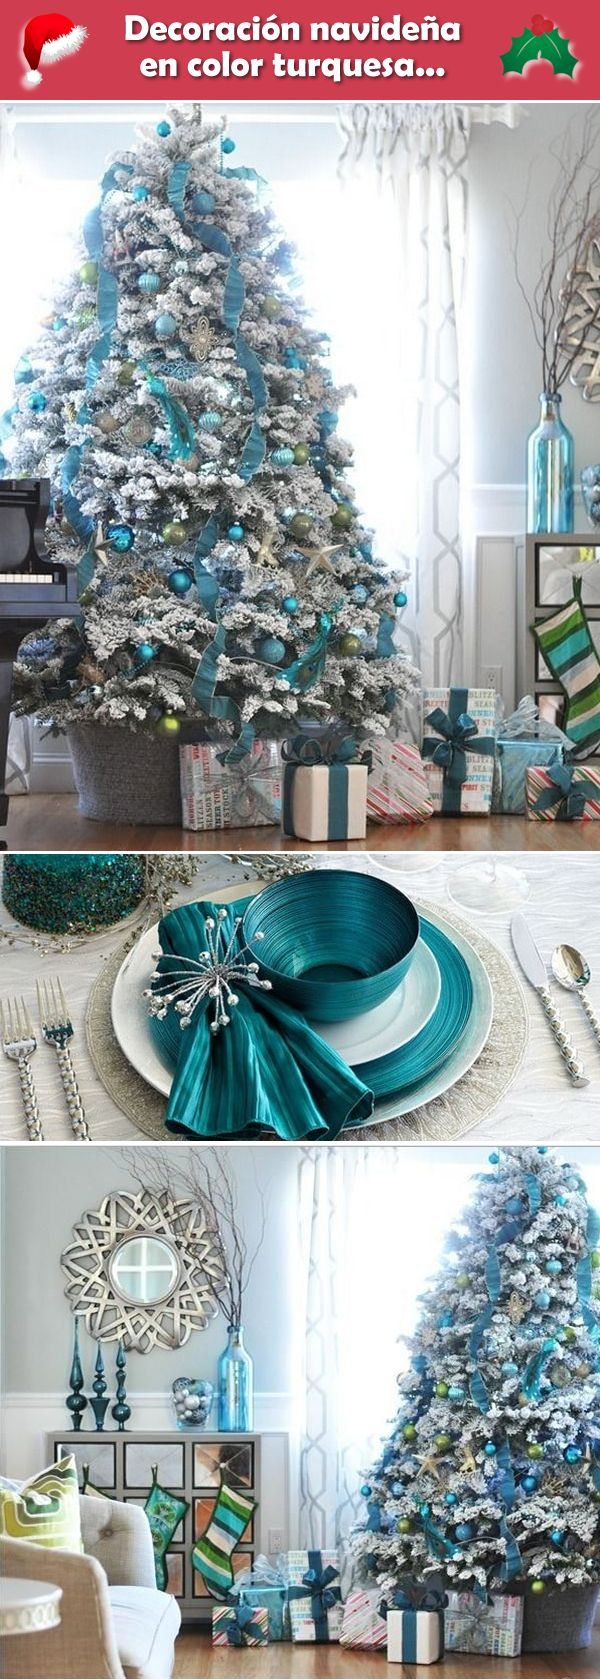 Decoración navideña en color turquesa. Navidad turquesa. Decoración navideña en color azul.